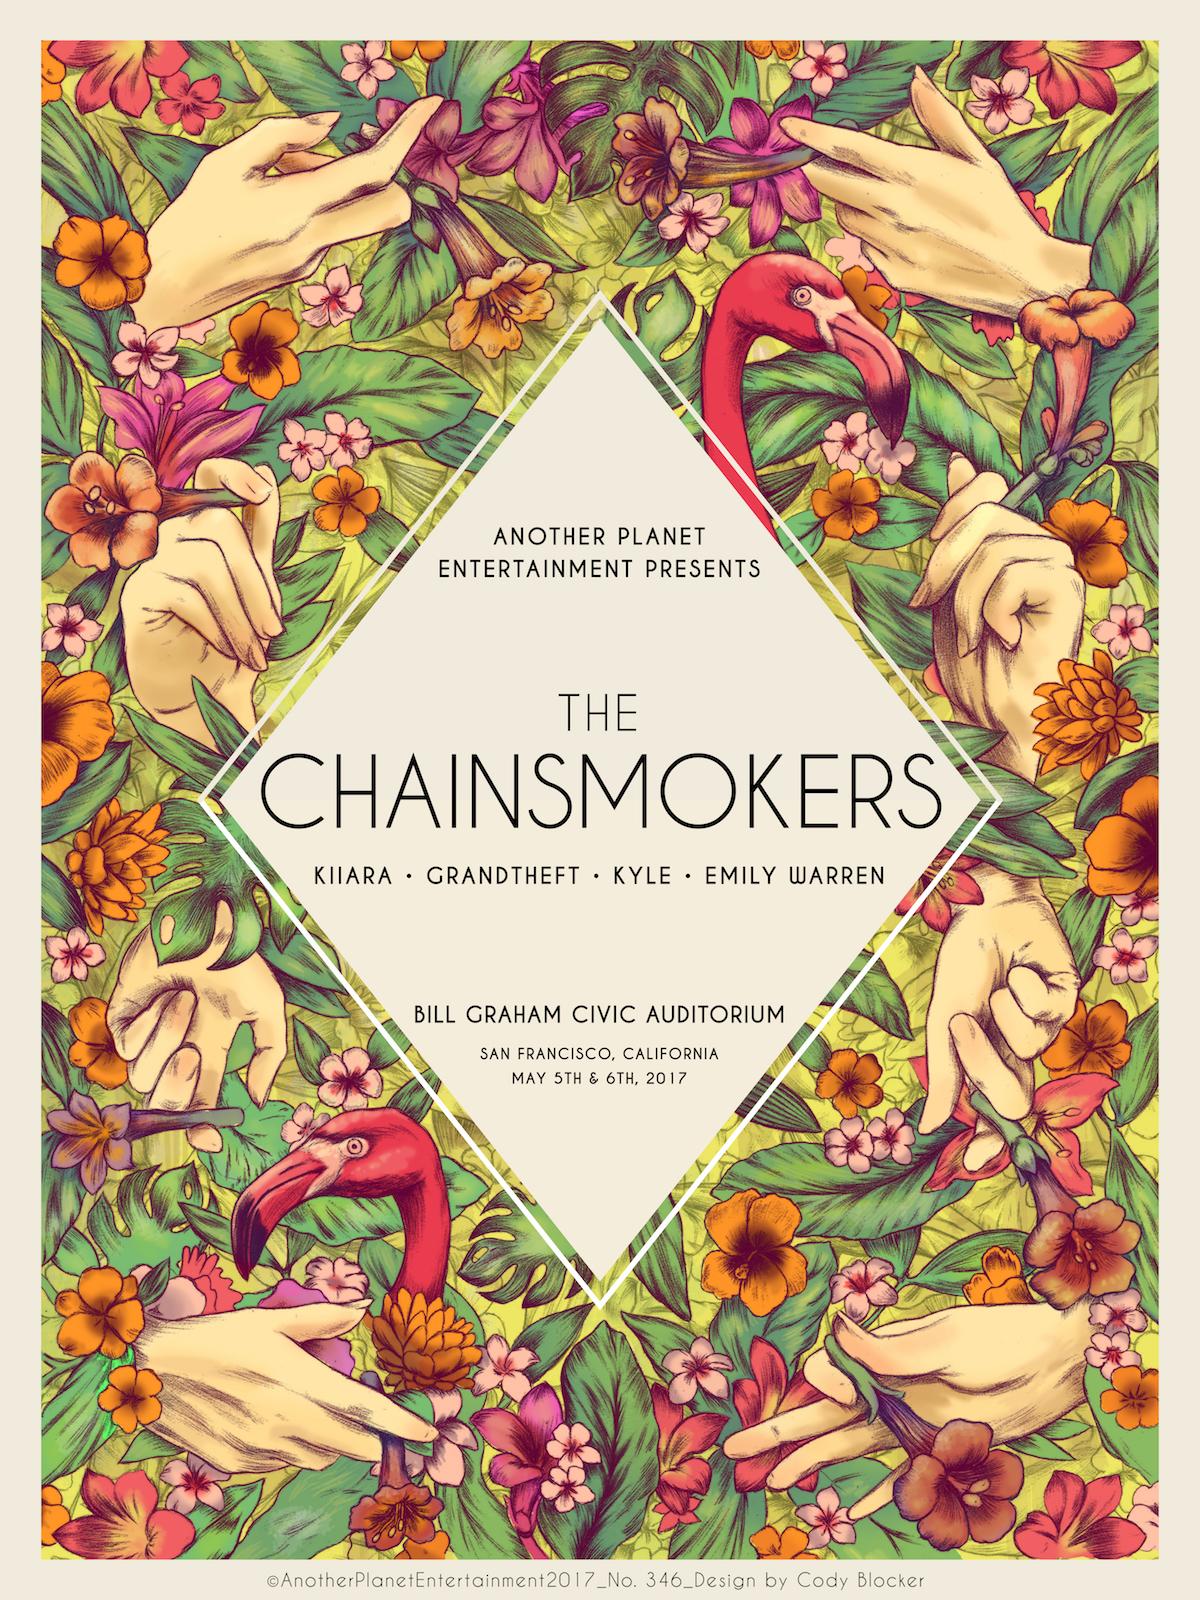 Chainsmokers_Final_small.jpg